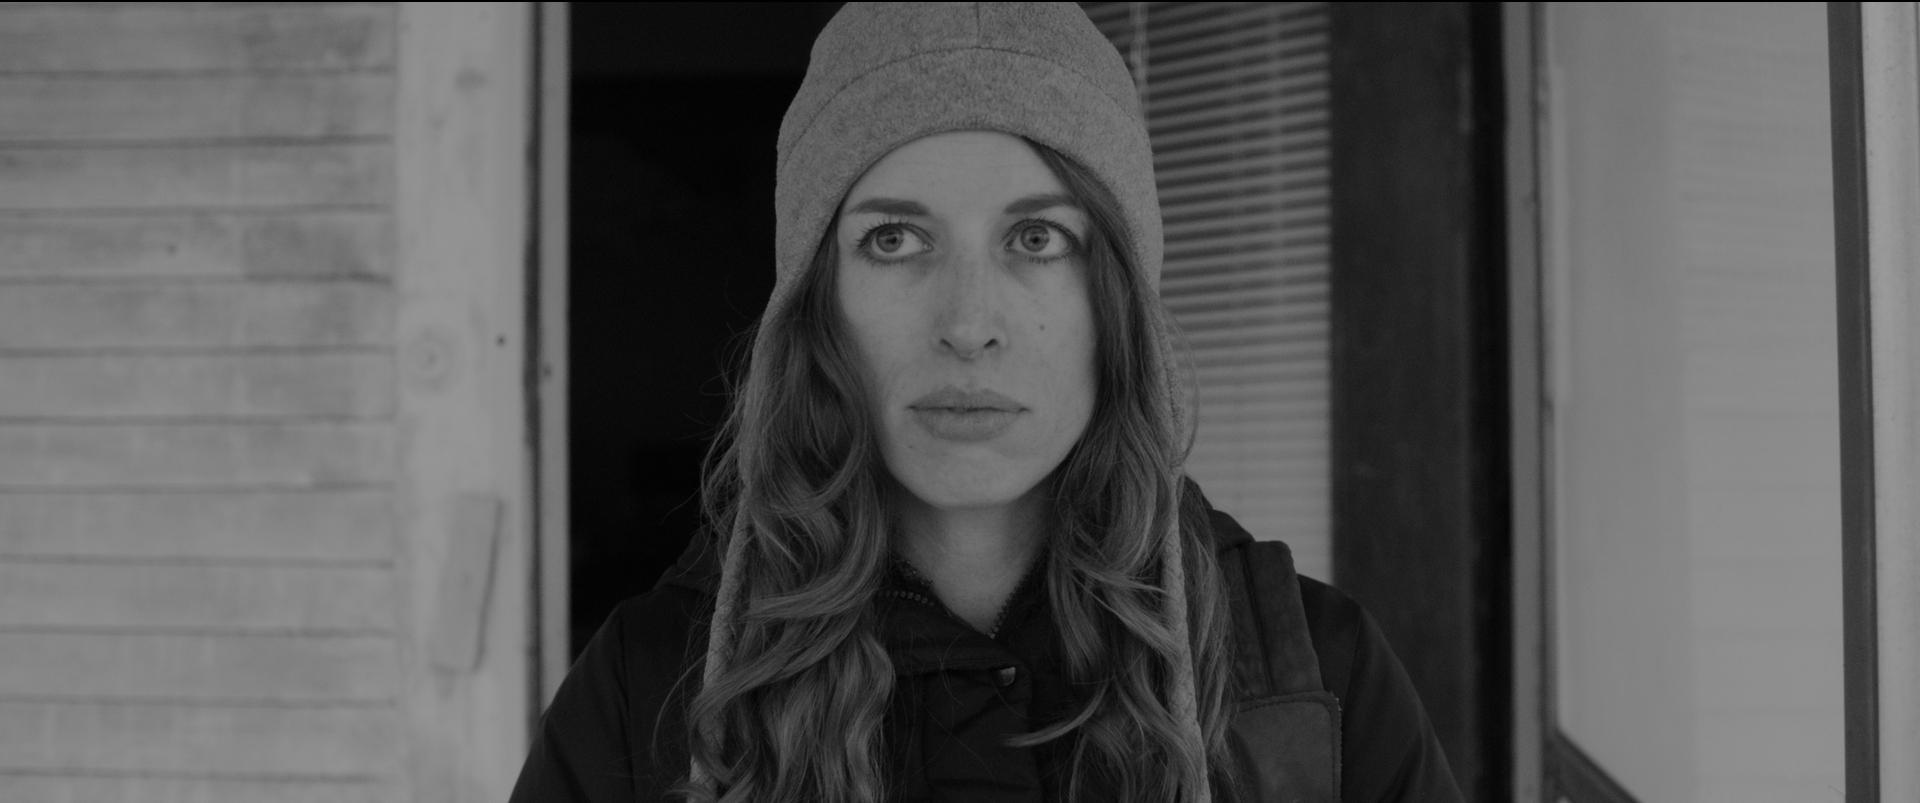 """The Wagon"" (Short film) frame grab"